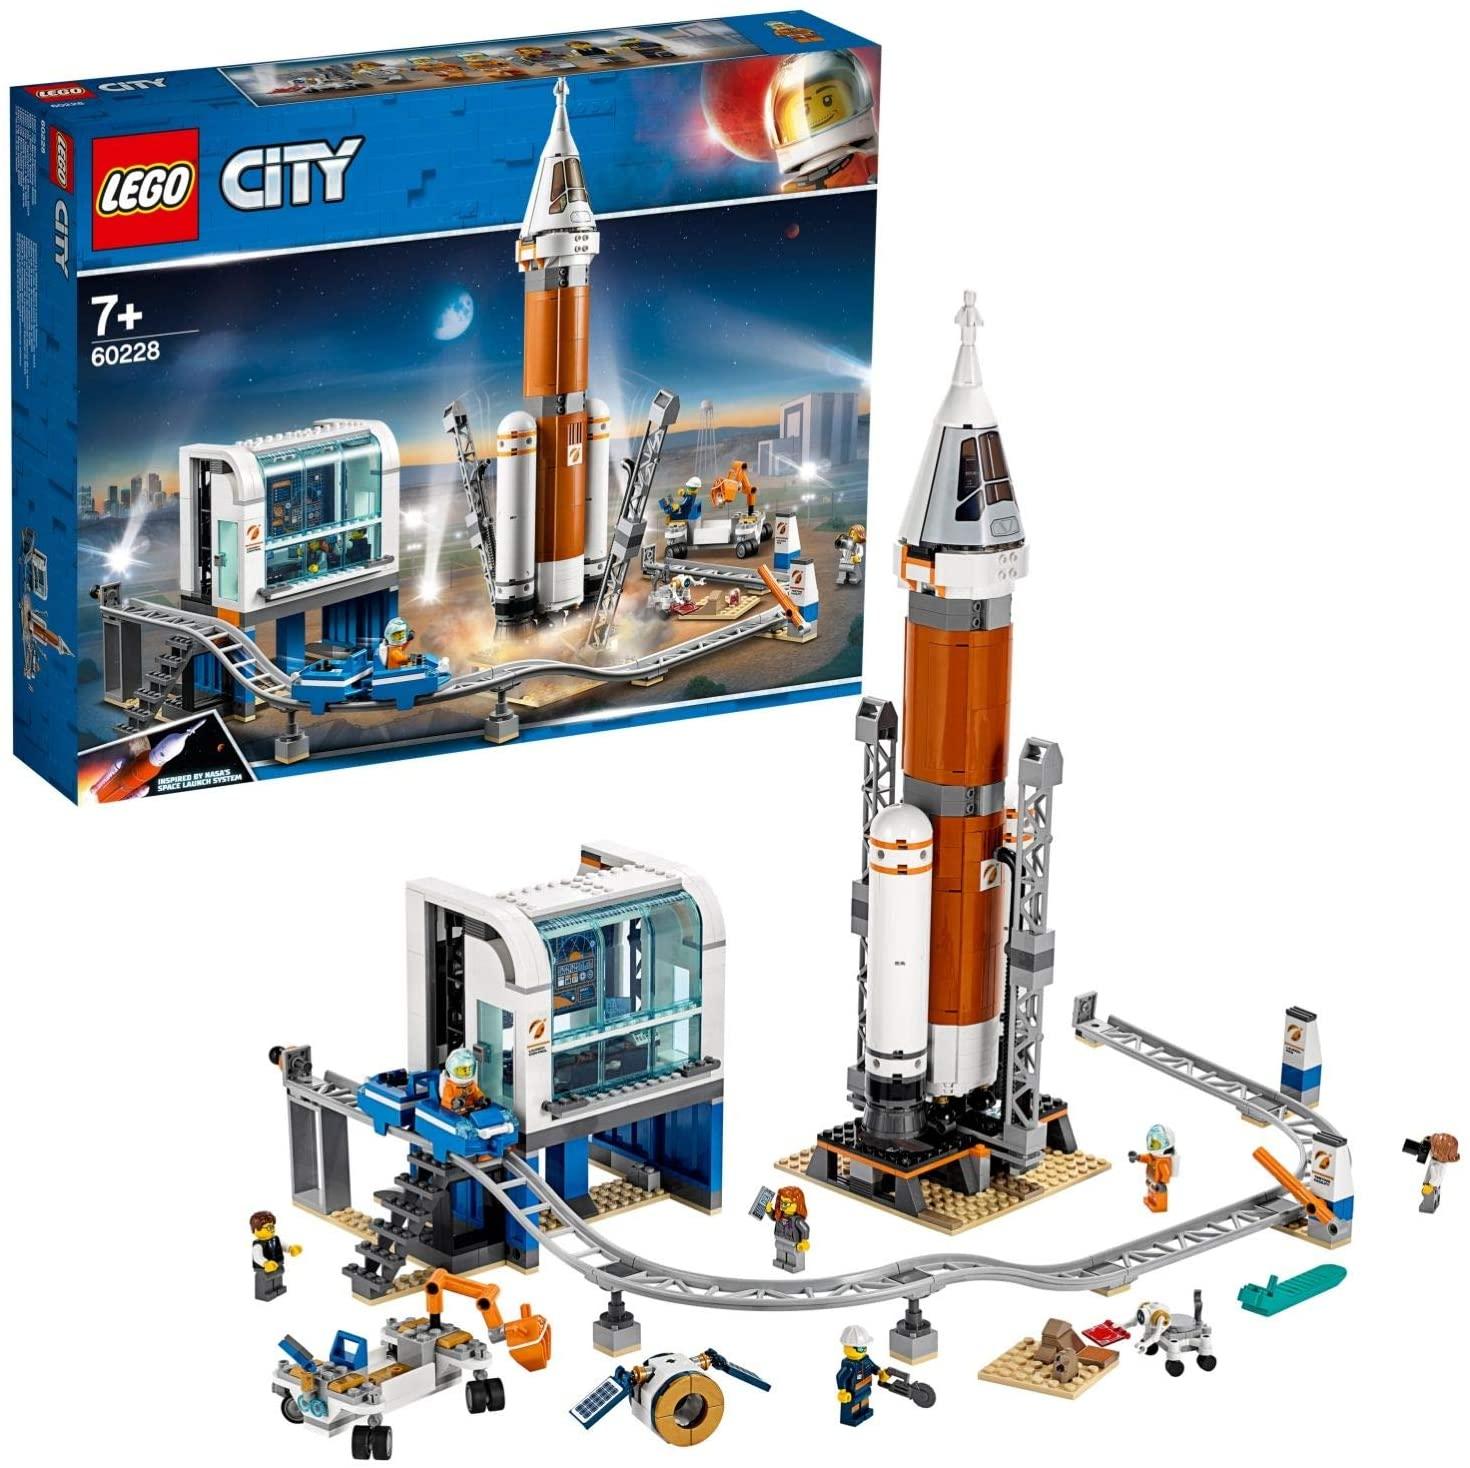 LEGO 60228 City Deep Space Rocket and Launch Control Building Set - £44.72 @ Amazon